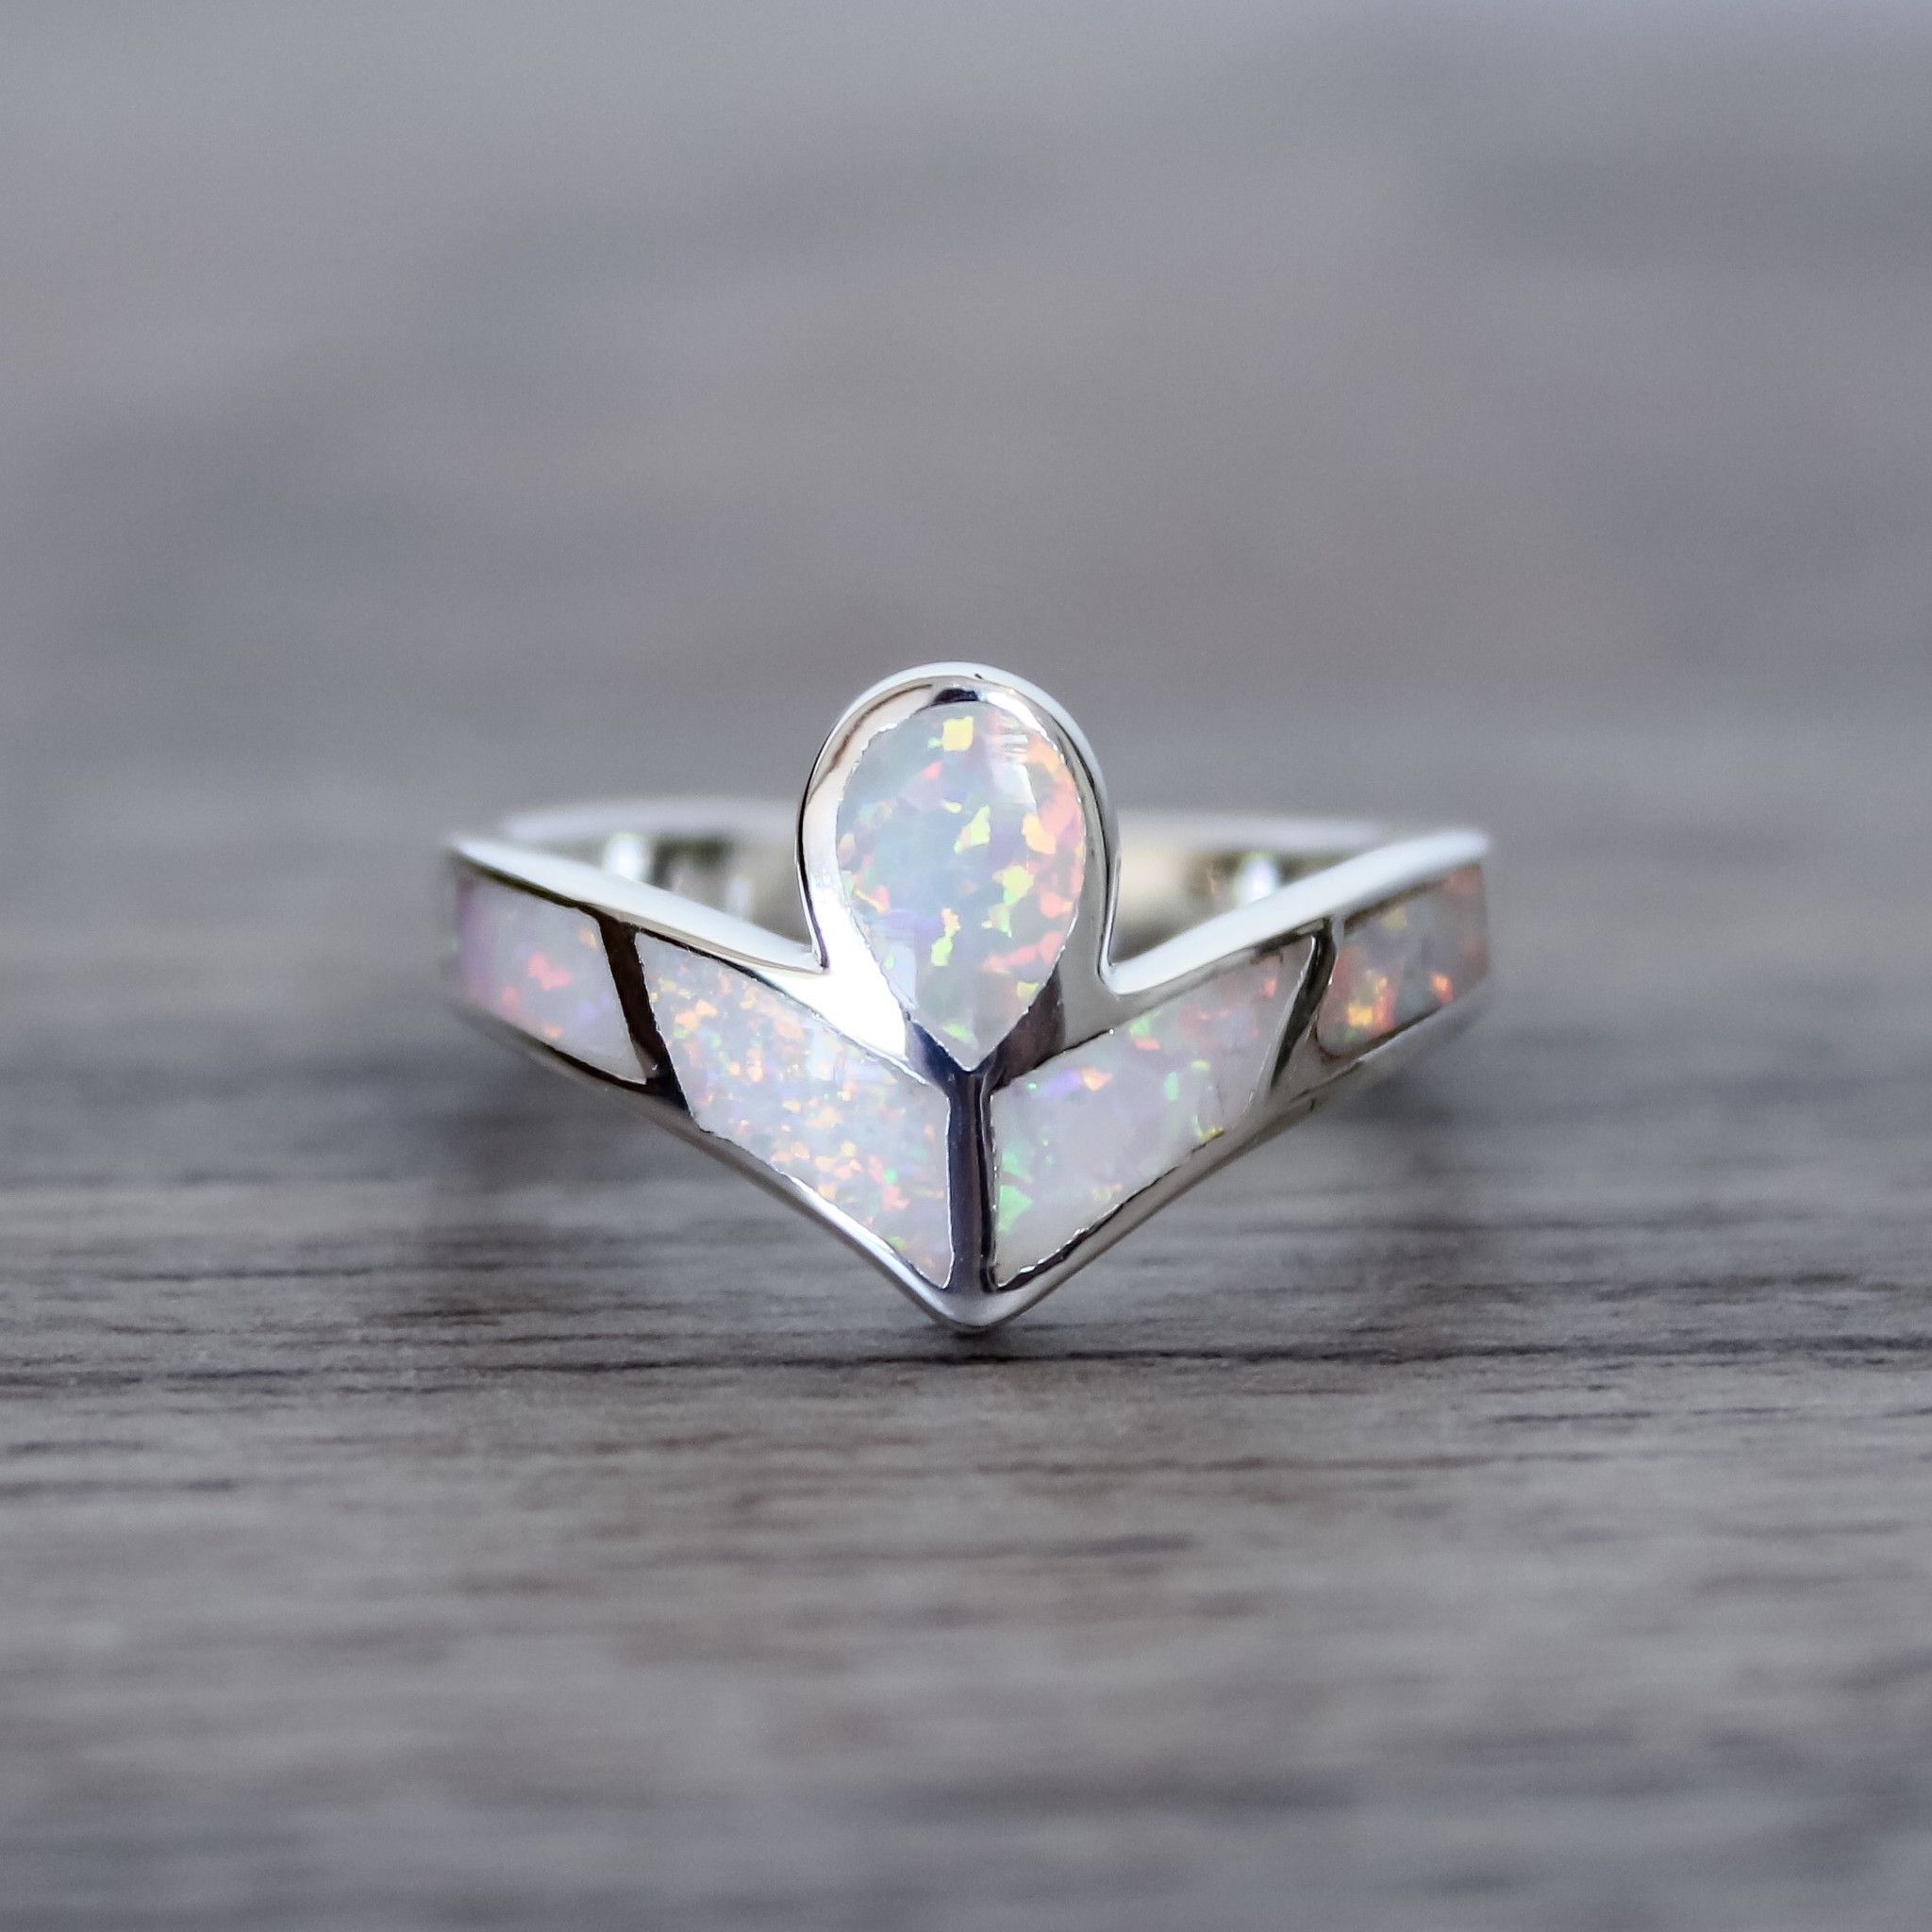 Angel Opal Ring | Boho festival, Opal rings and Indie